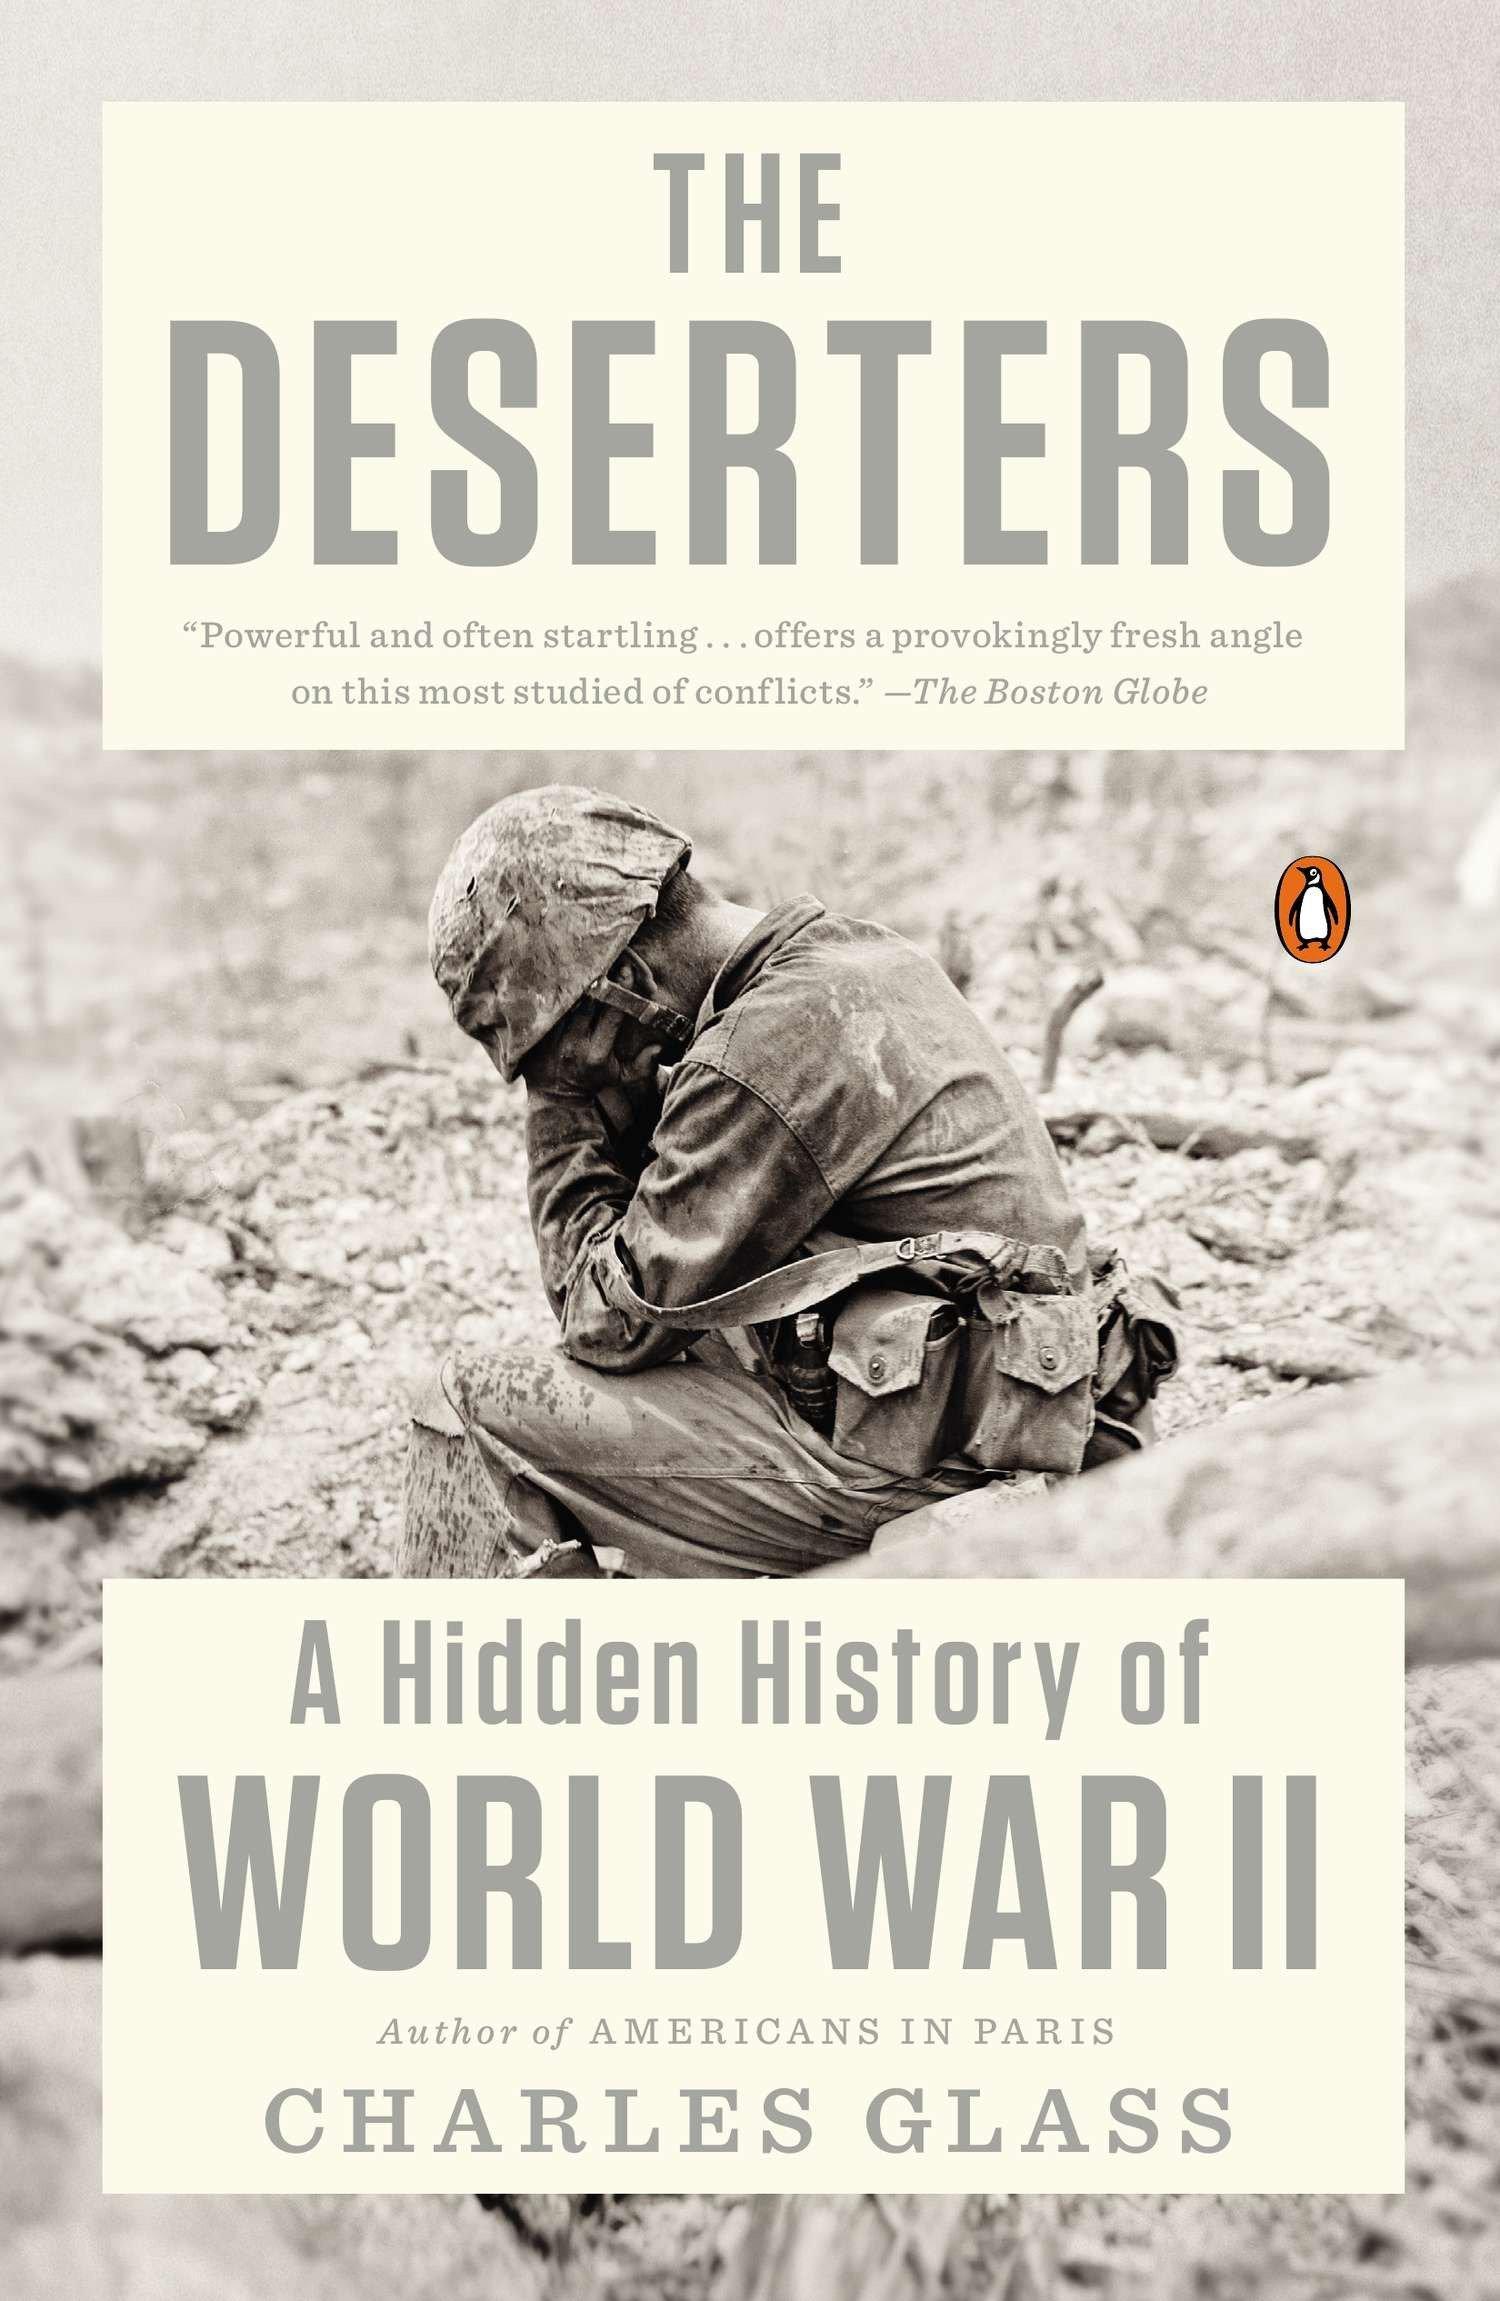 Amazon.com: The Deserters: A Hidden History of World War II  (9780143125488): Glass, Charles: Books